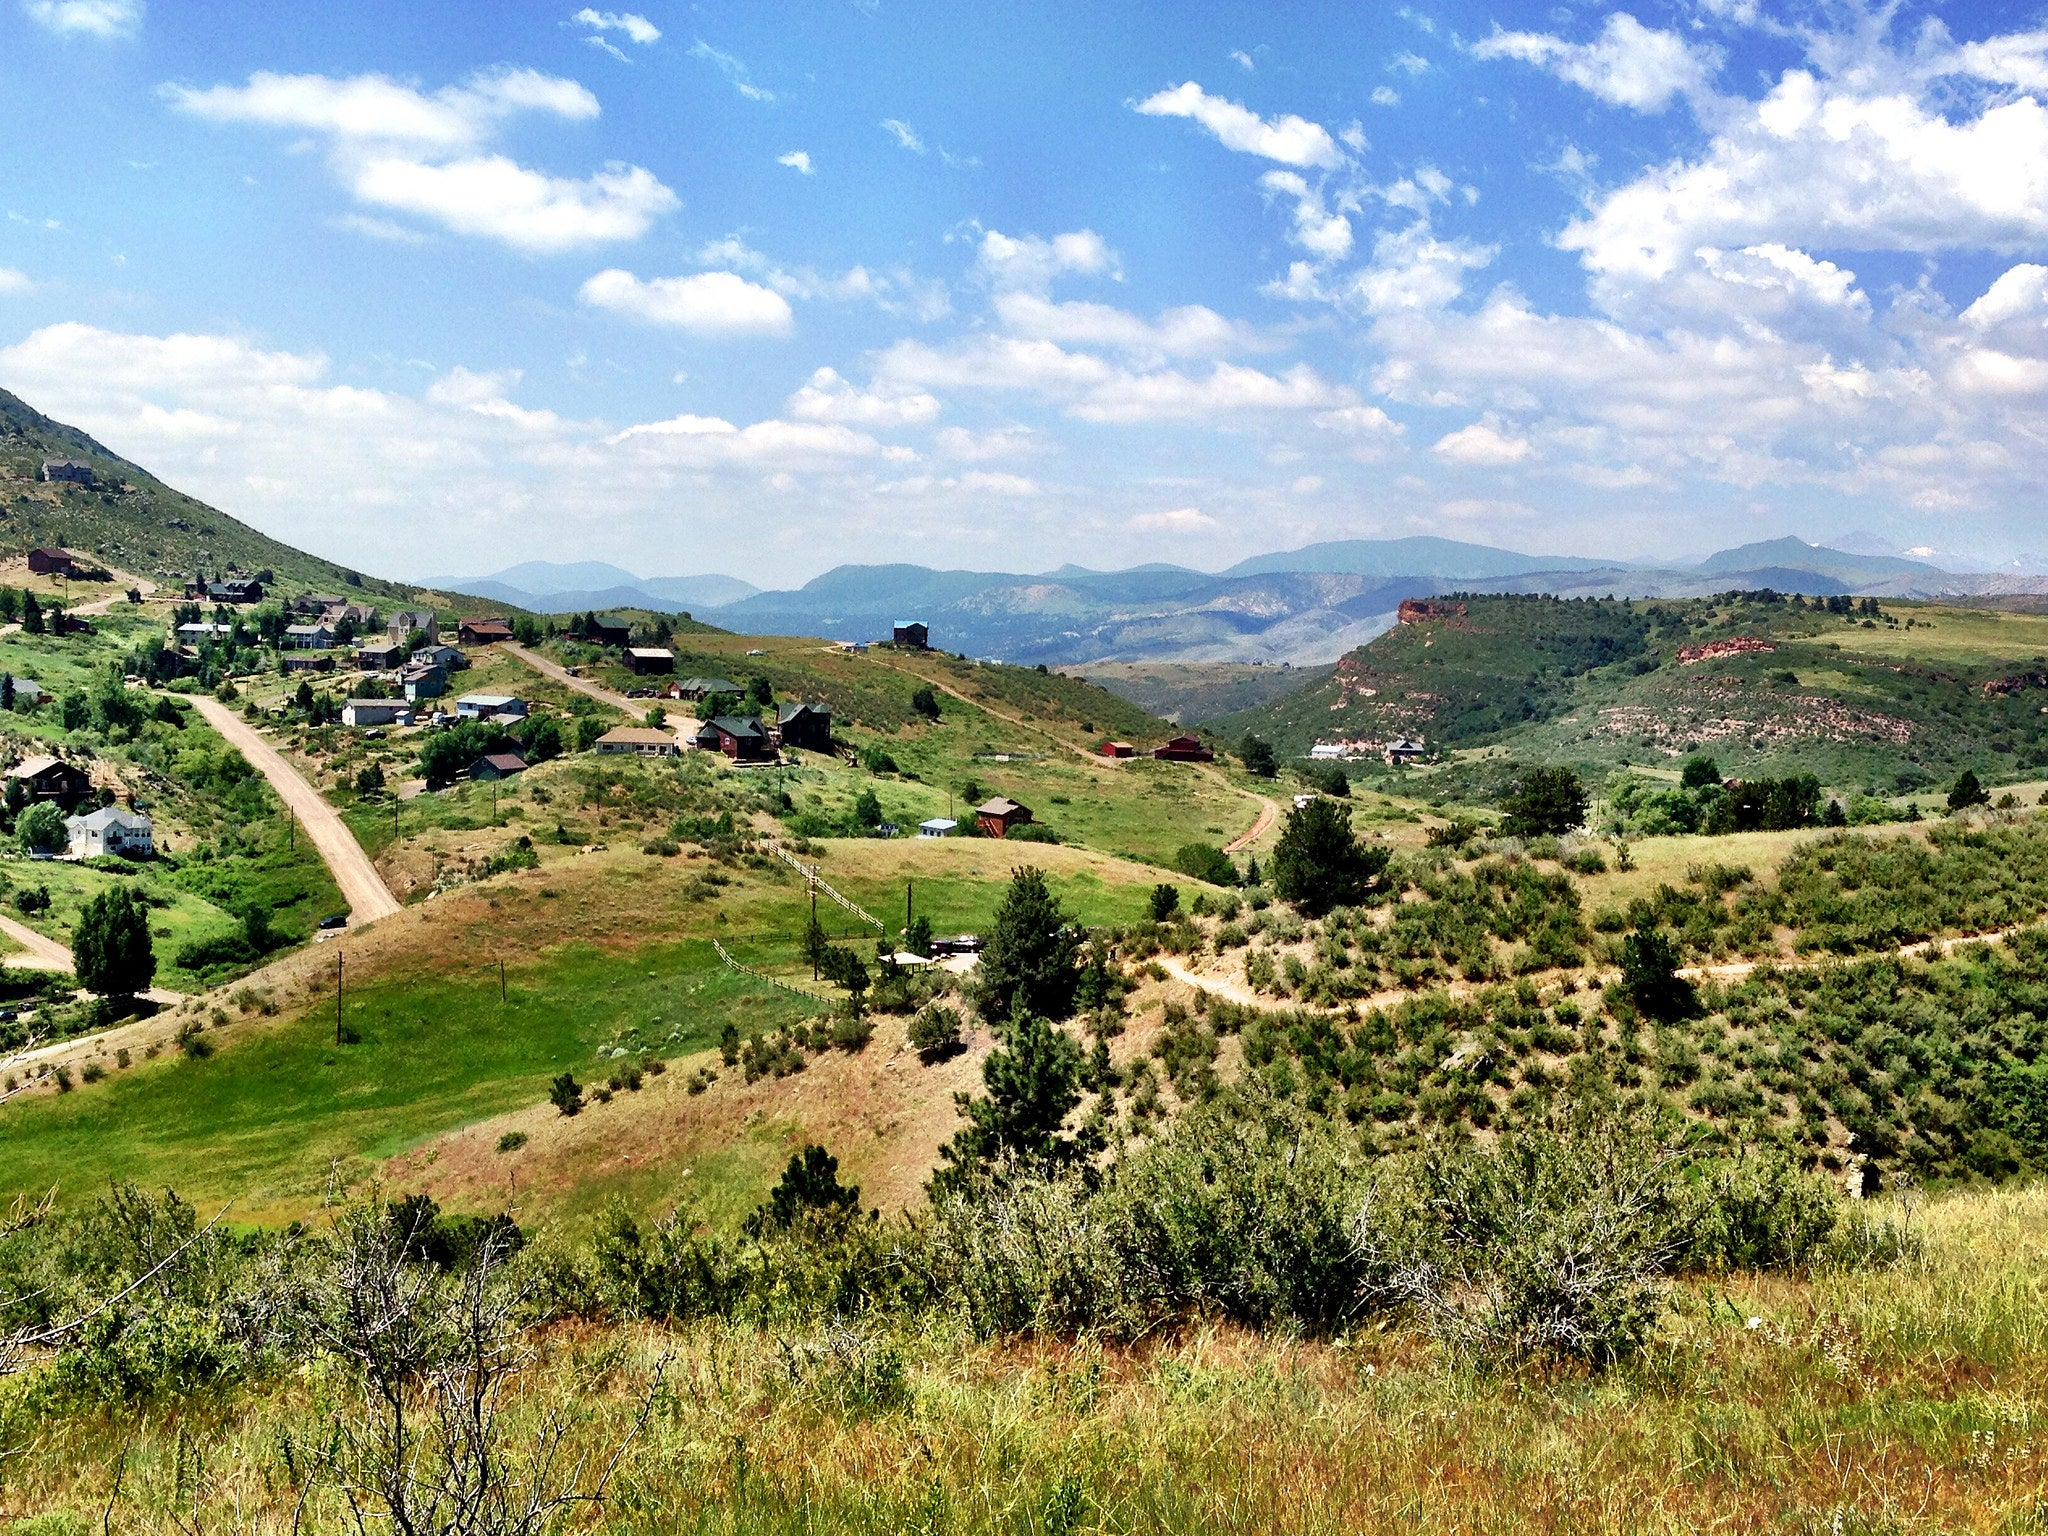 b7feeb2bda Vasque Grand Traverse Trail Runner Review - Backpacker